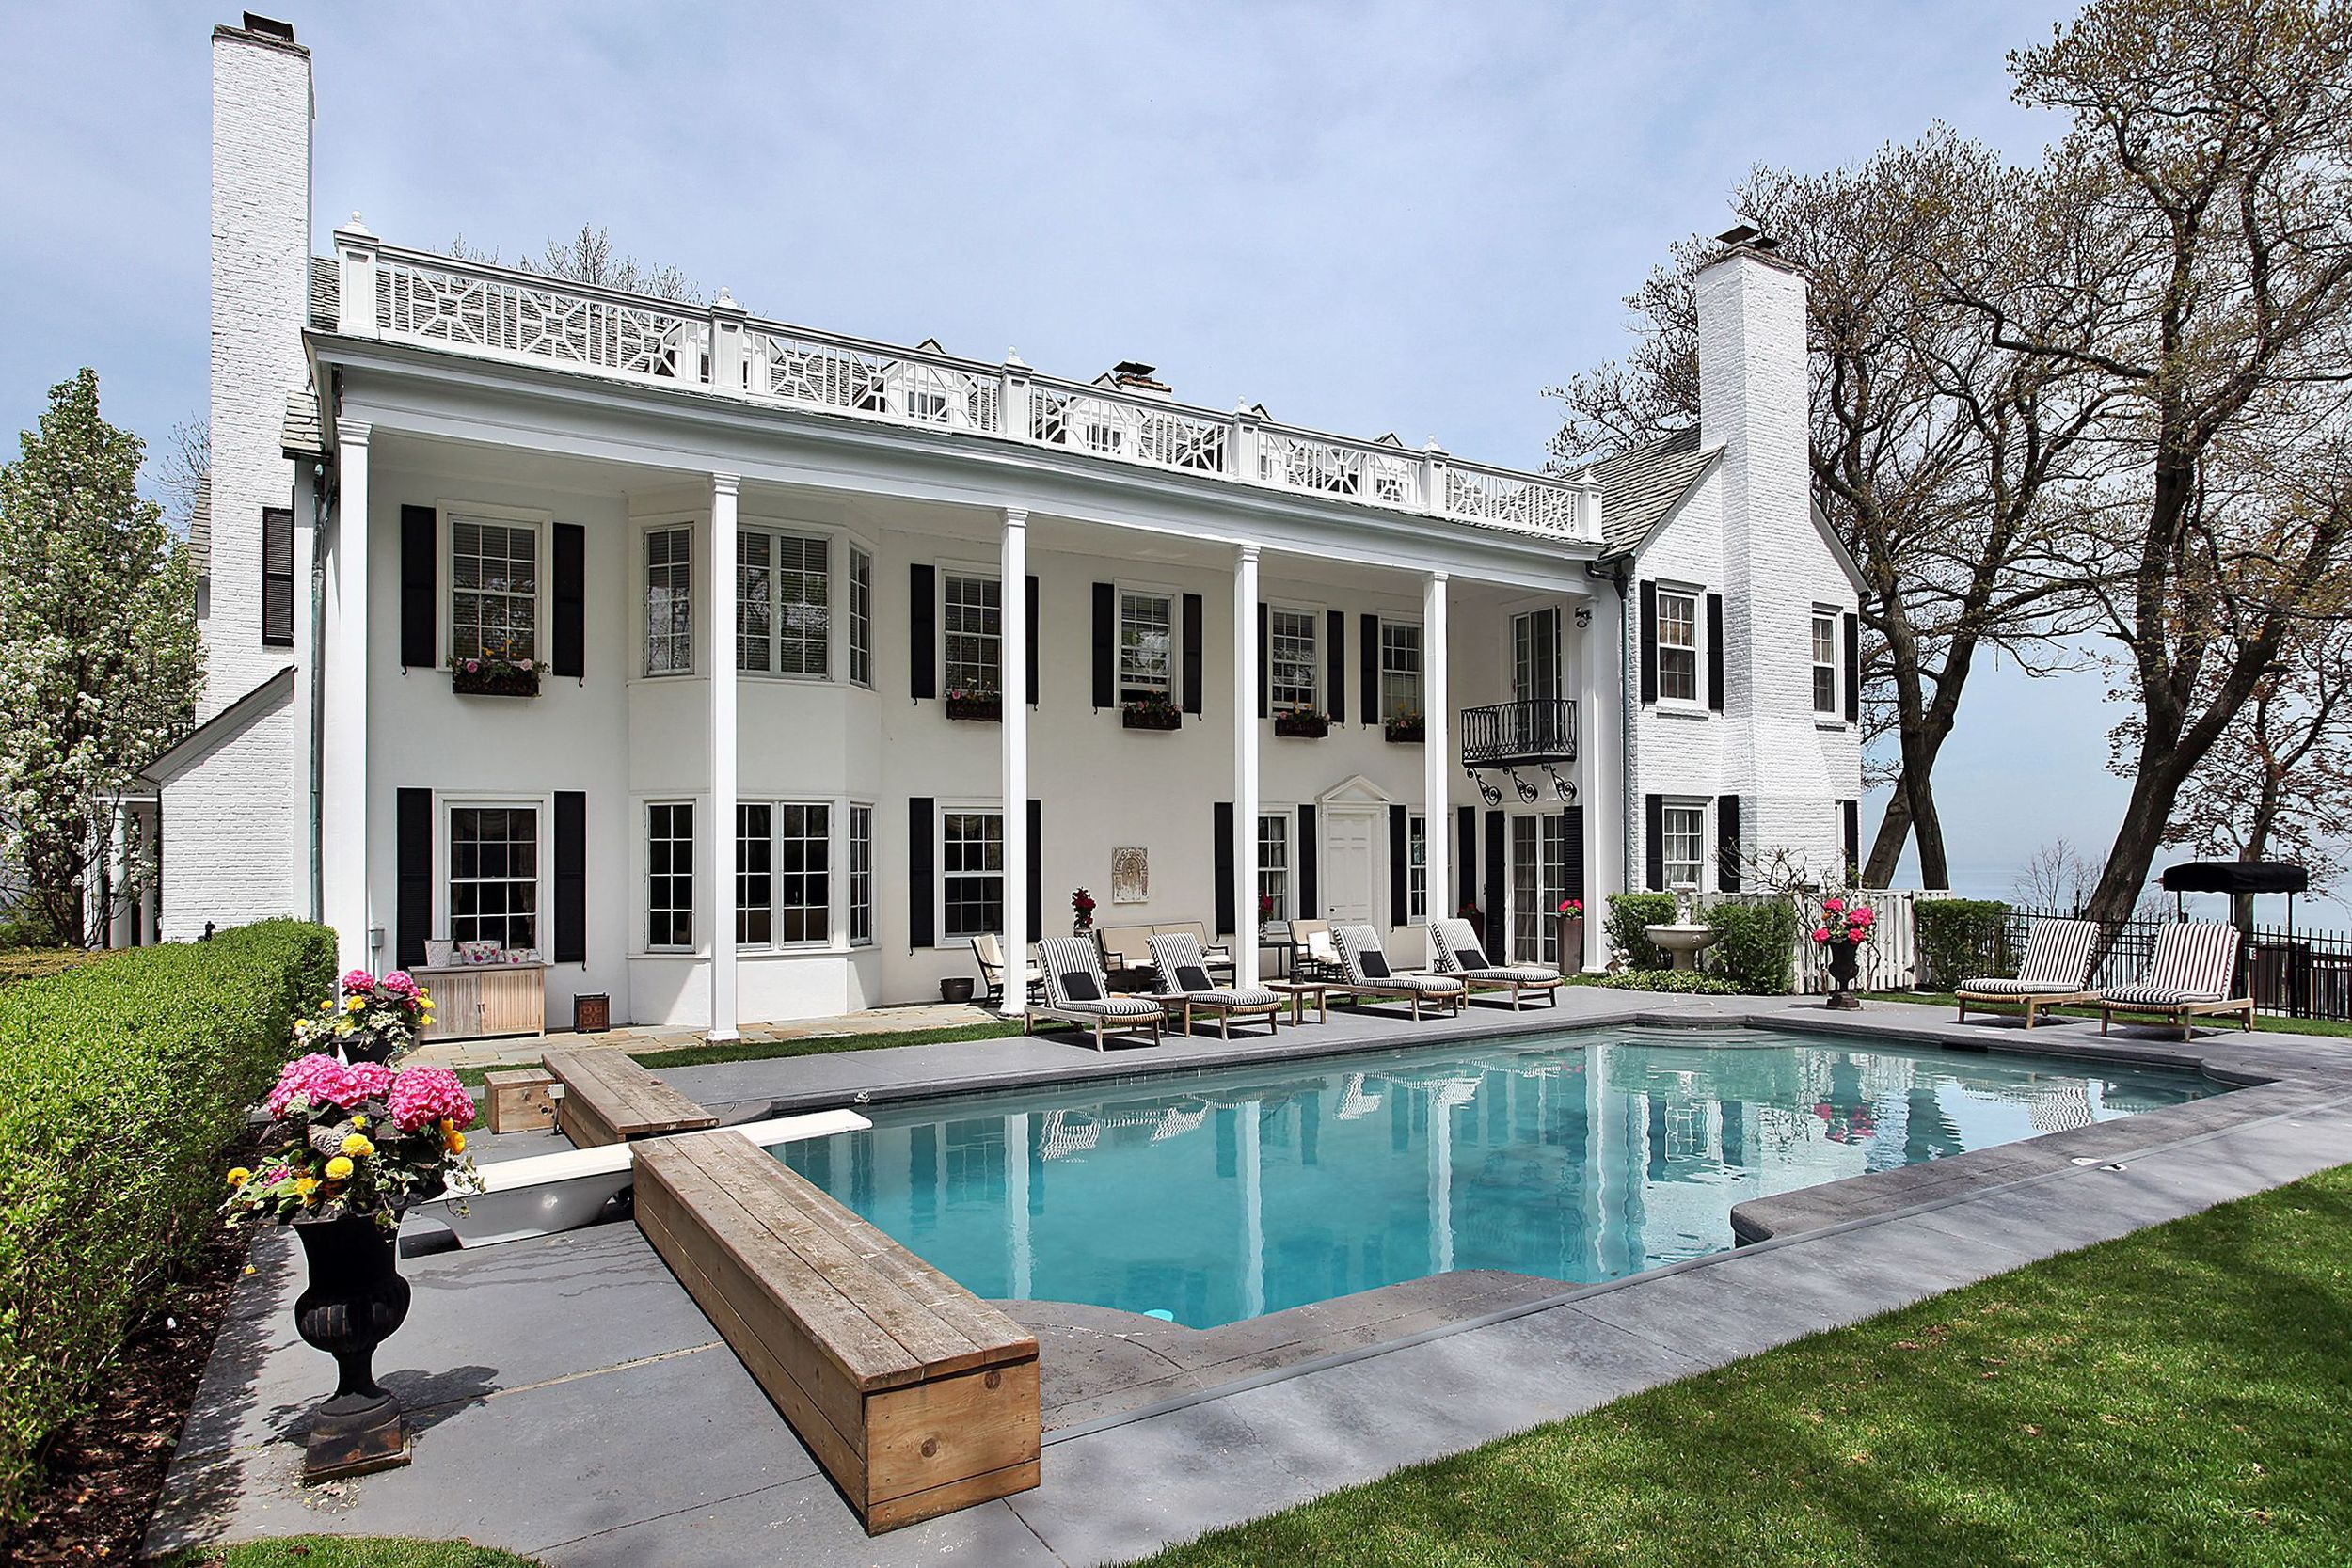 13 House with Pool.jpg